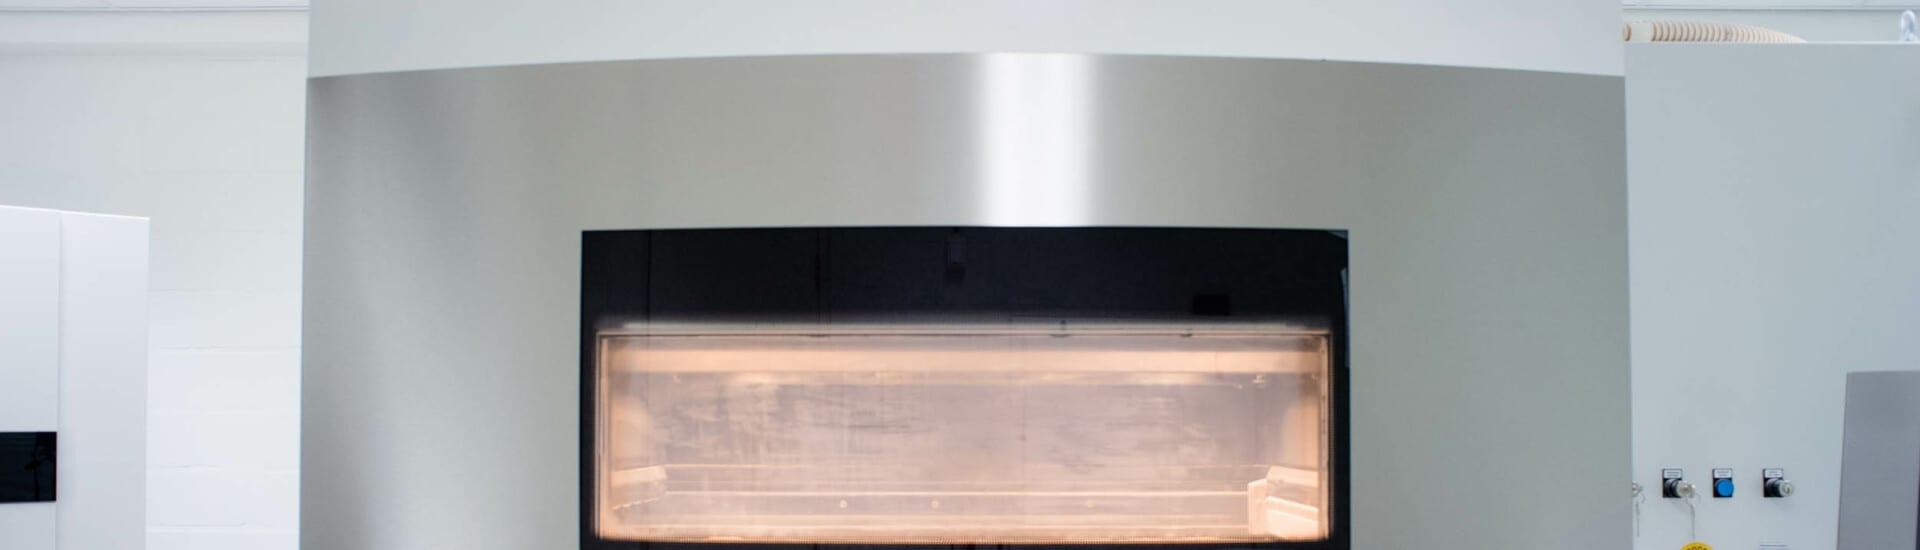 SLS 3D printing - Oceanz 3D Printing